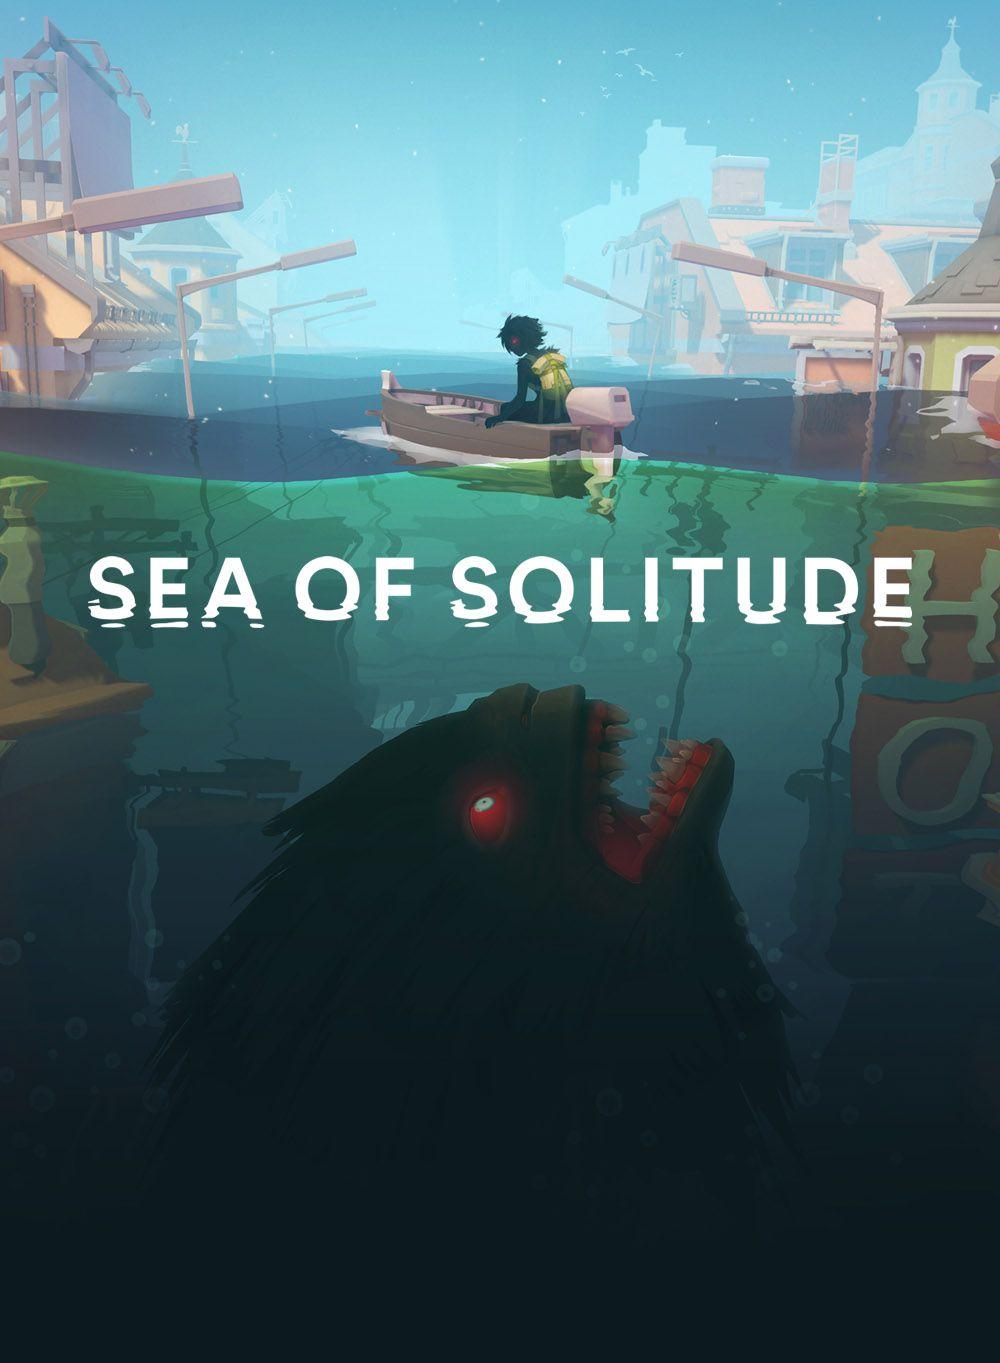 jaquette du jeu vidéo Sea of Solitude